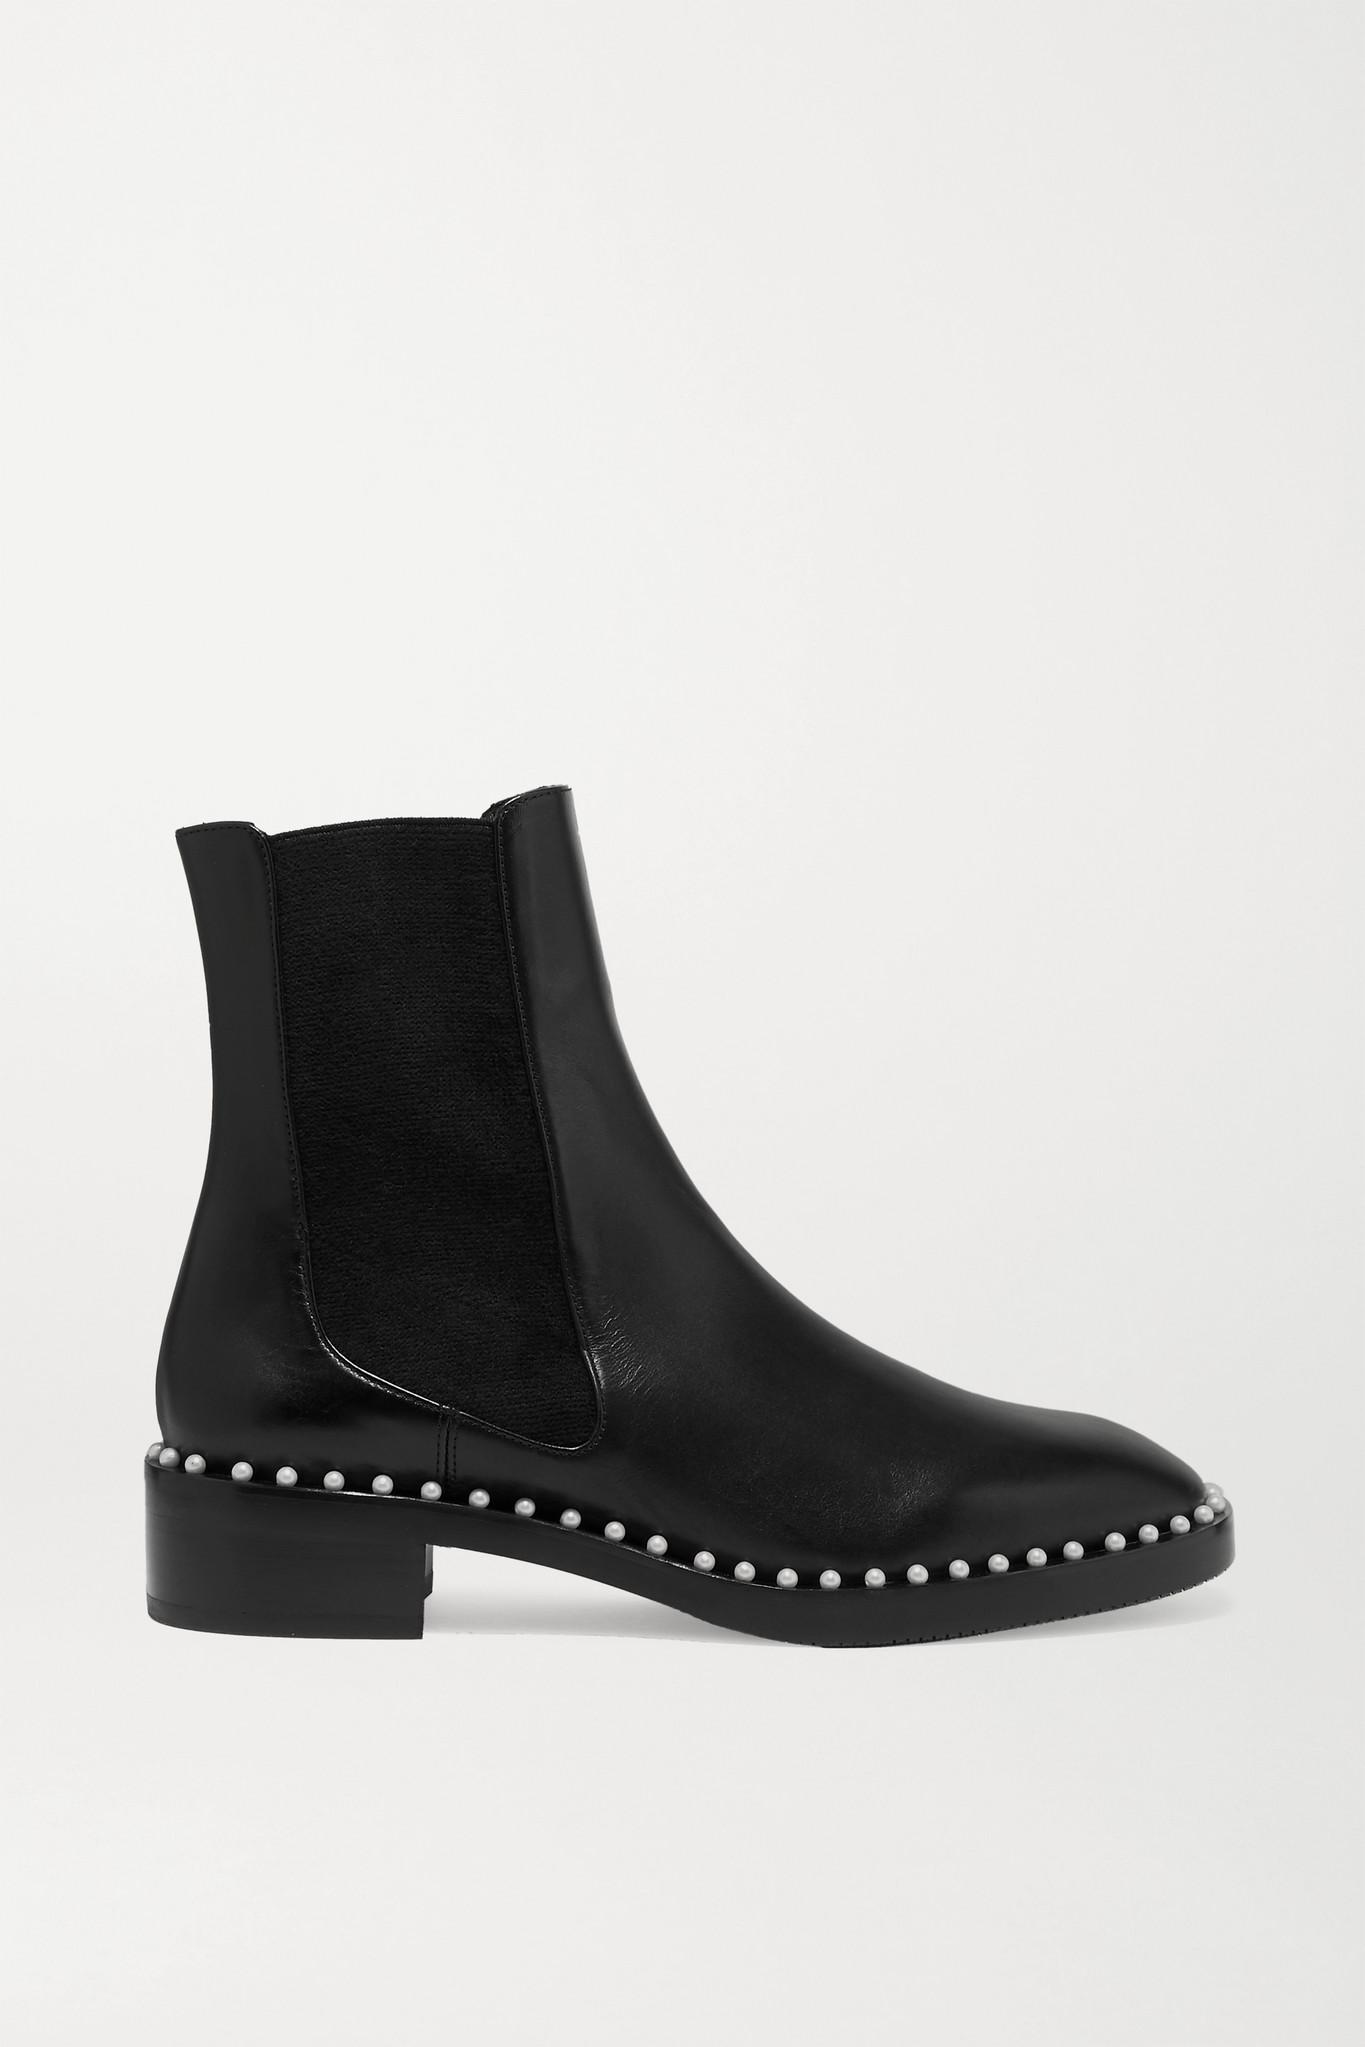 STUART WEITZMAN - Cline 人造珍珠缀饰皮革切尔西靴 - 黑色 - IT38